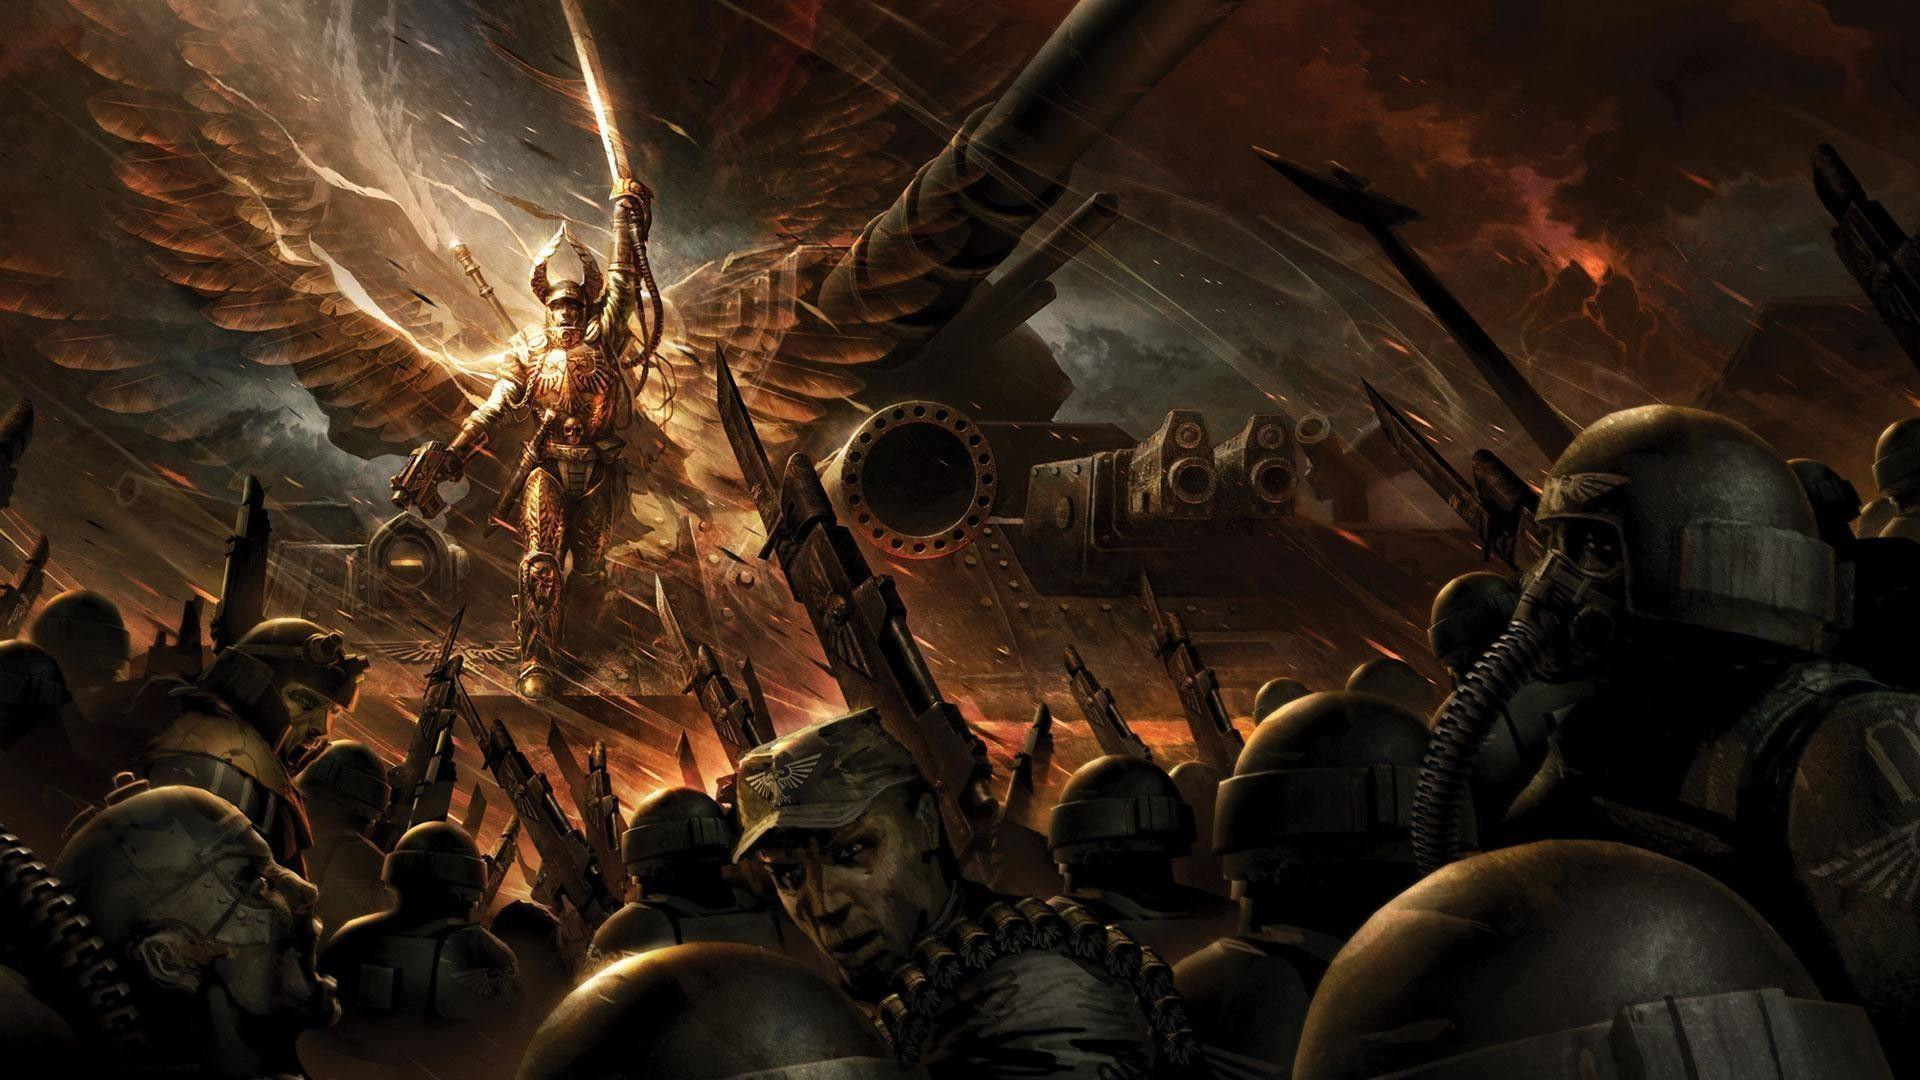 Warhammer 40k Wallpapers - Wallpaper Cave